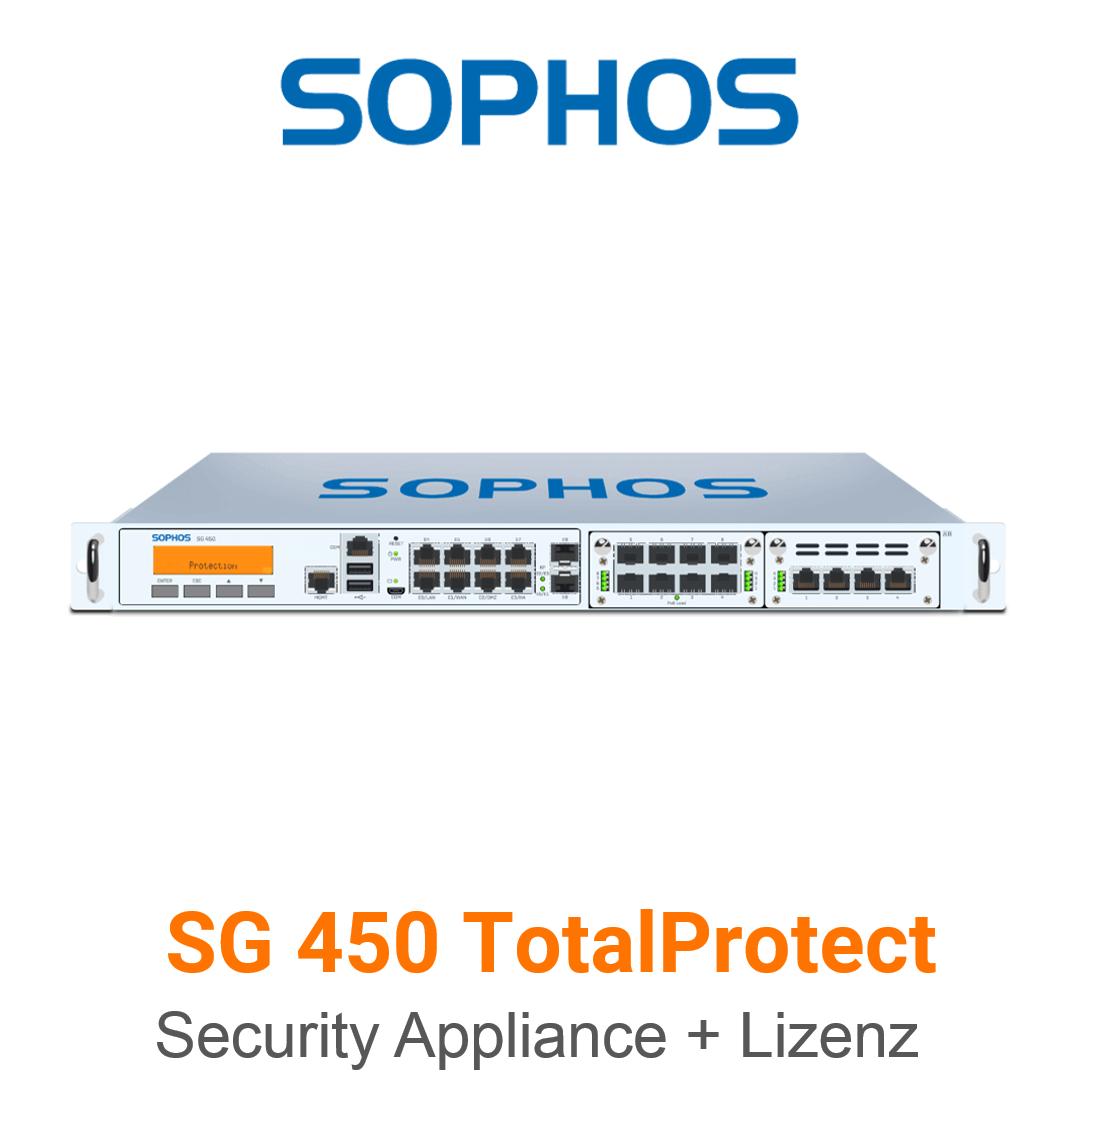 Sophos SG 450 TotalProtect Bundle (Hardware + Lizenz)